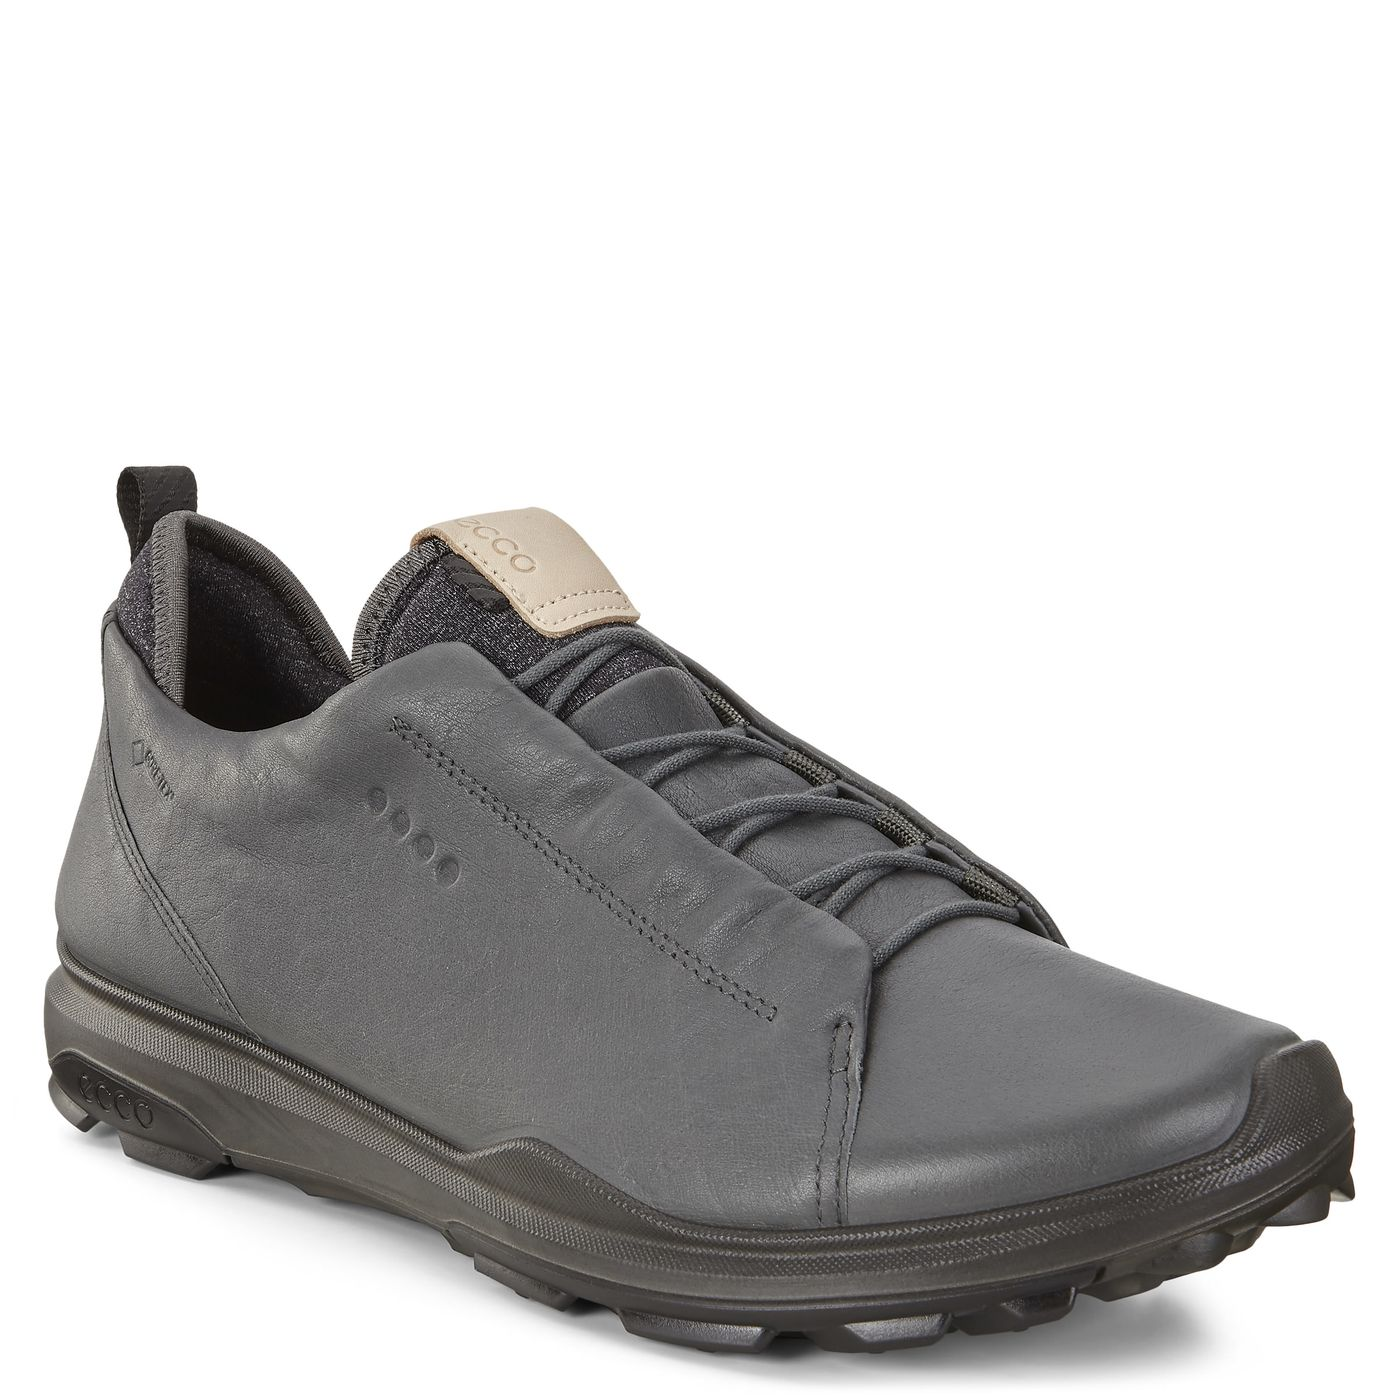 Biom Hybrid 3 2.0 Men's Golf Shoes